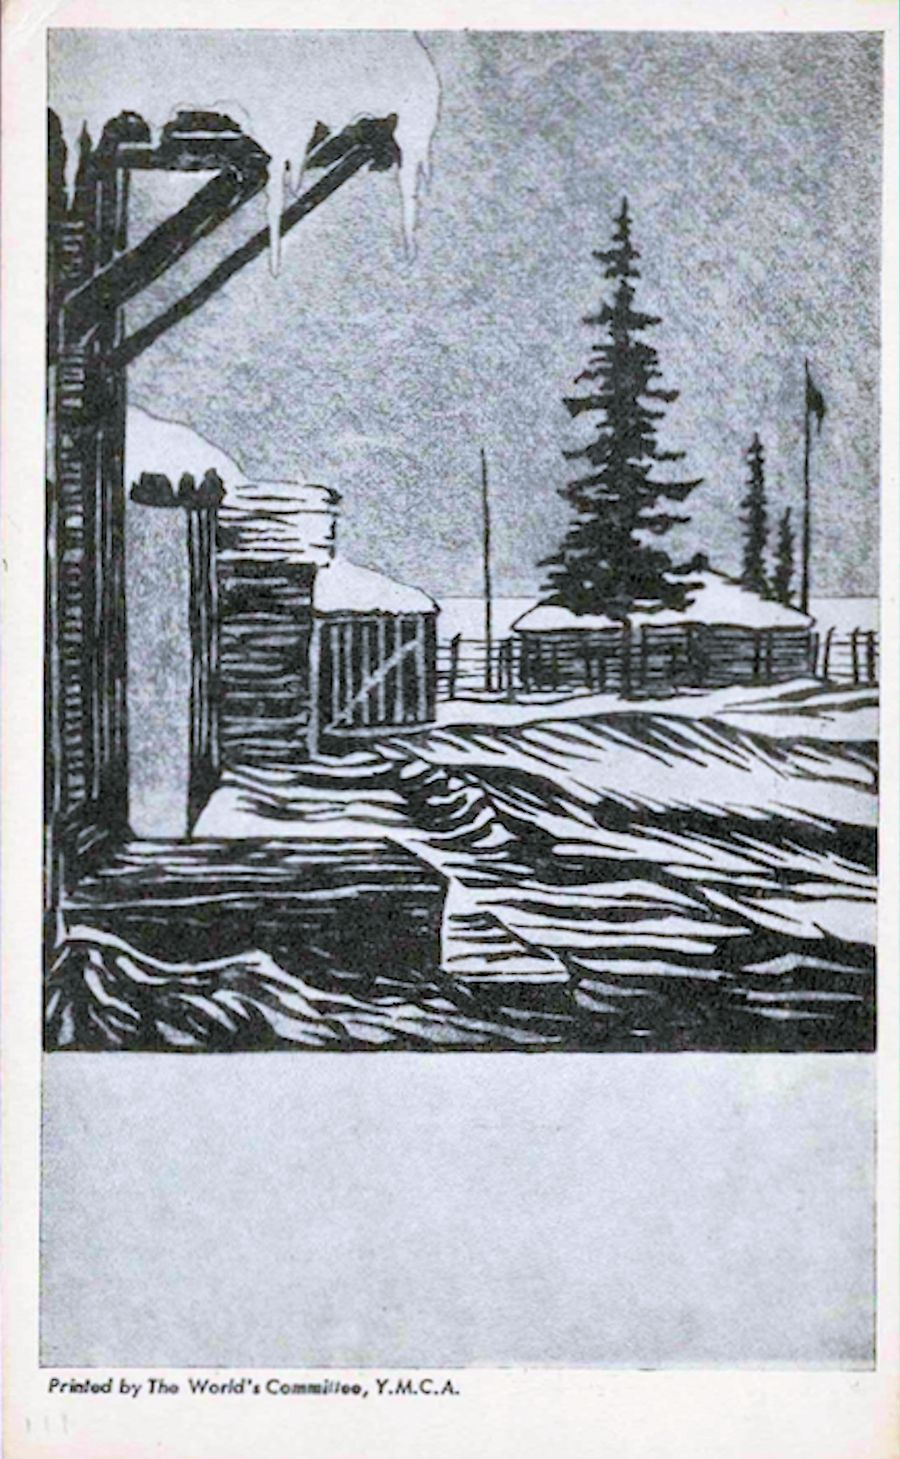 19??;Canada;The World's Committee, YMCA ; WW II-Era Christmas POW Card